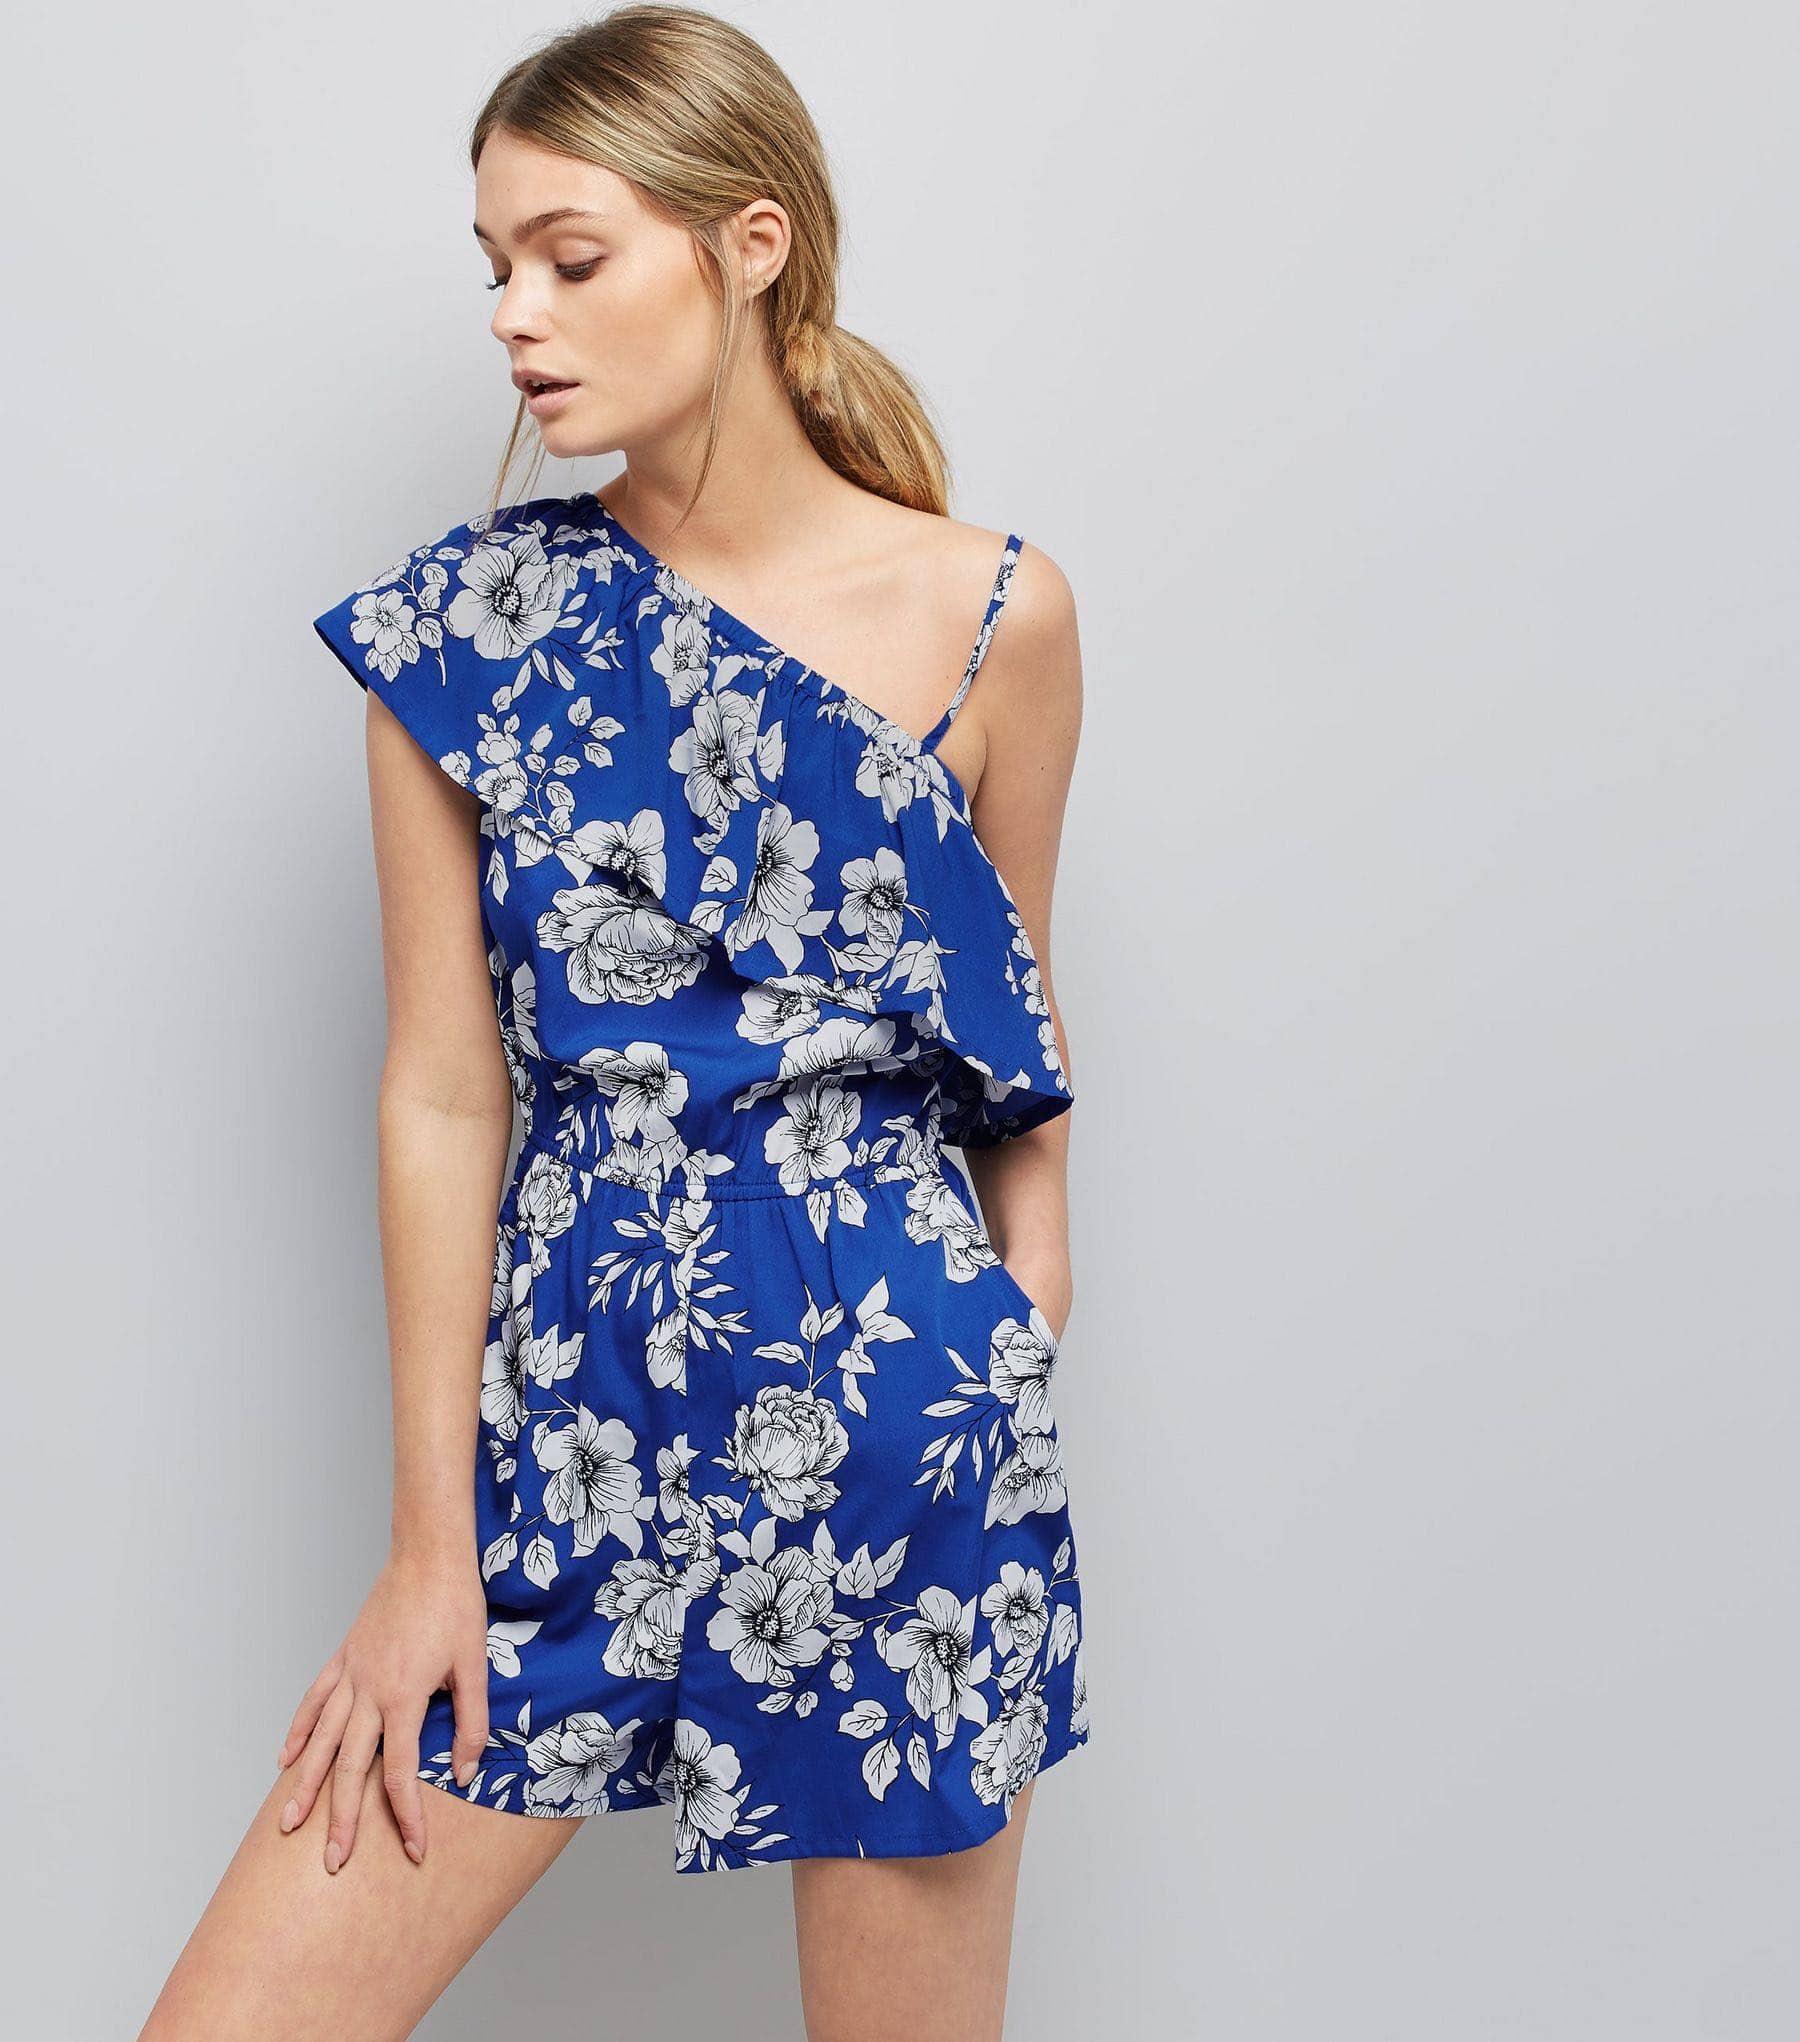 New Look Blue Floral Print Asymmetric Frill Trim Playsuit